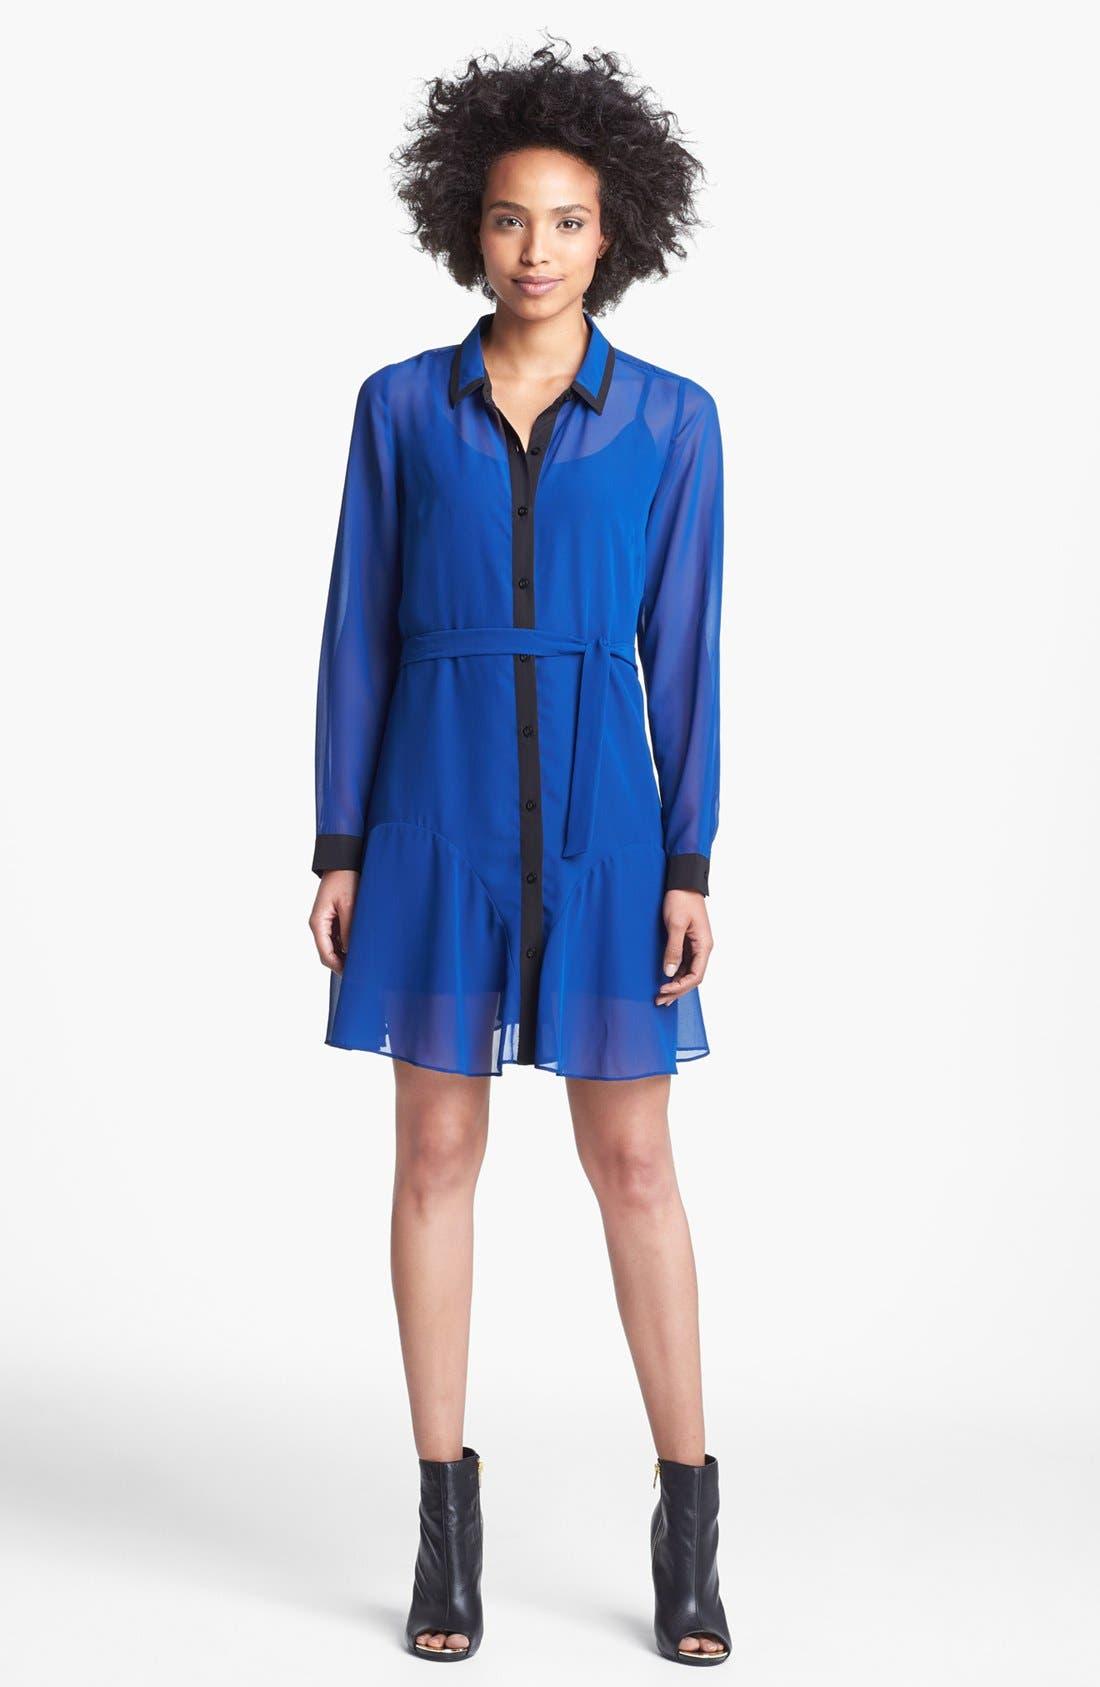 Alternate Image 1 Selected - Jessica Simpson 'Adelynn' Shirtdress